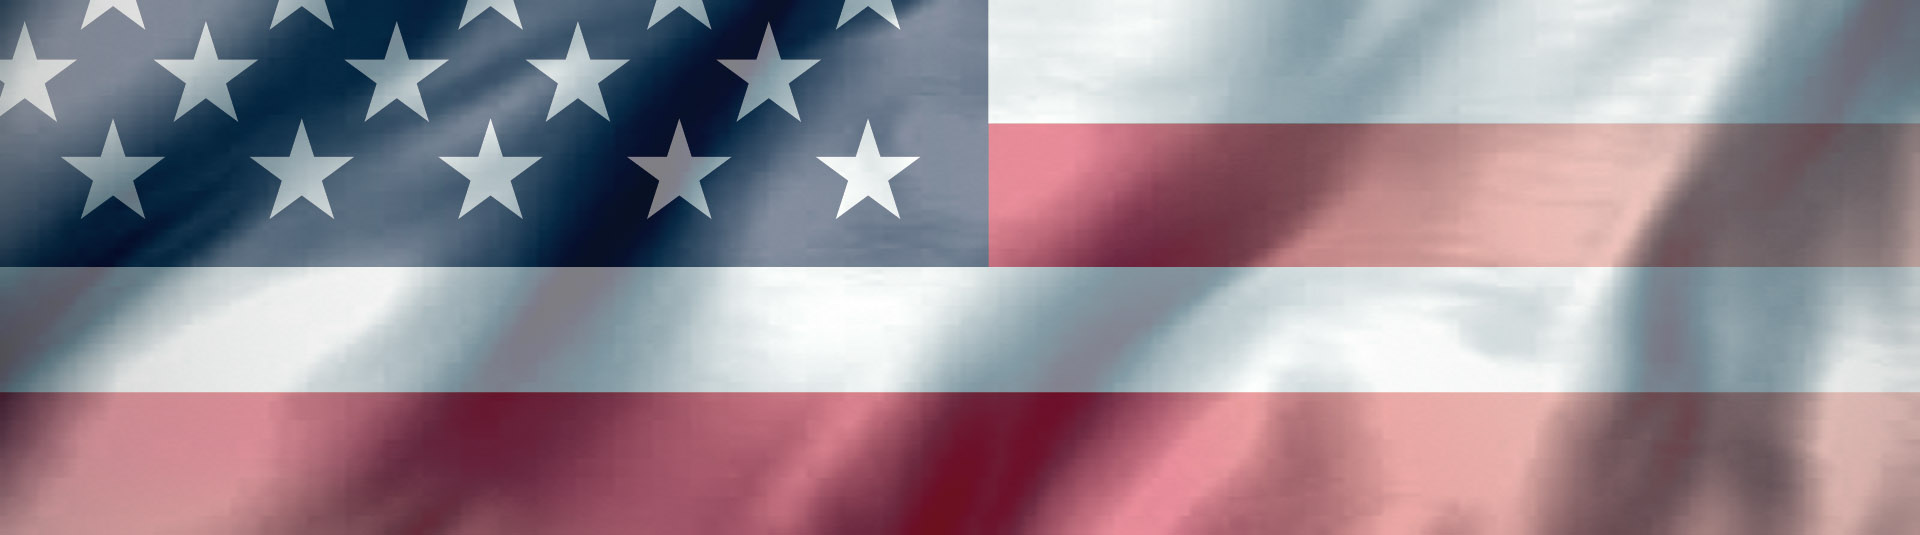 flag-background